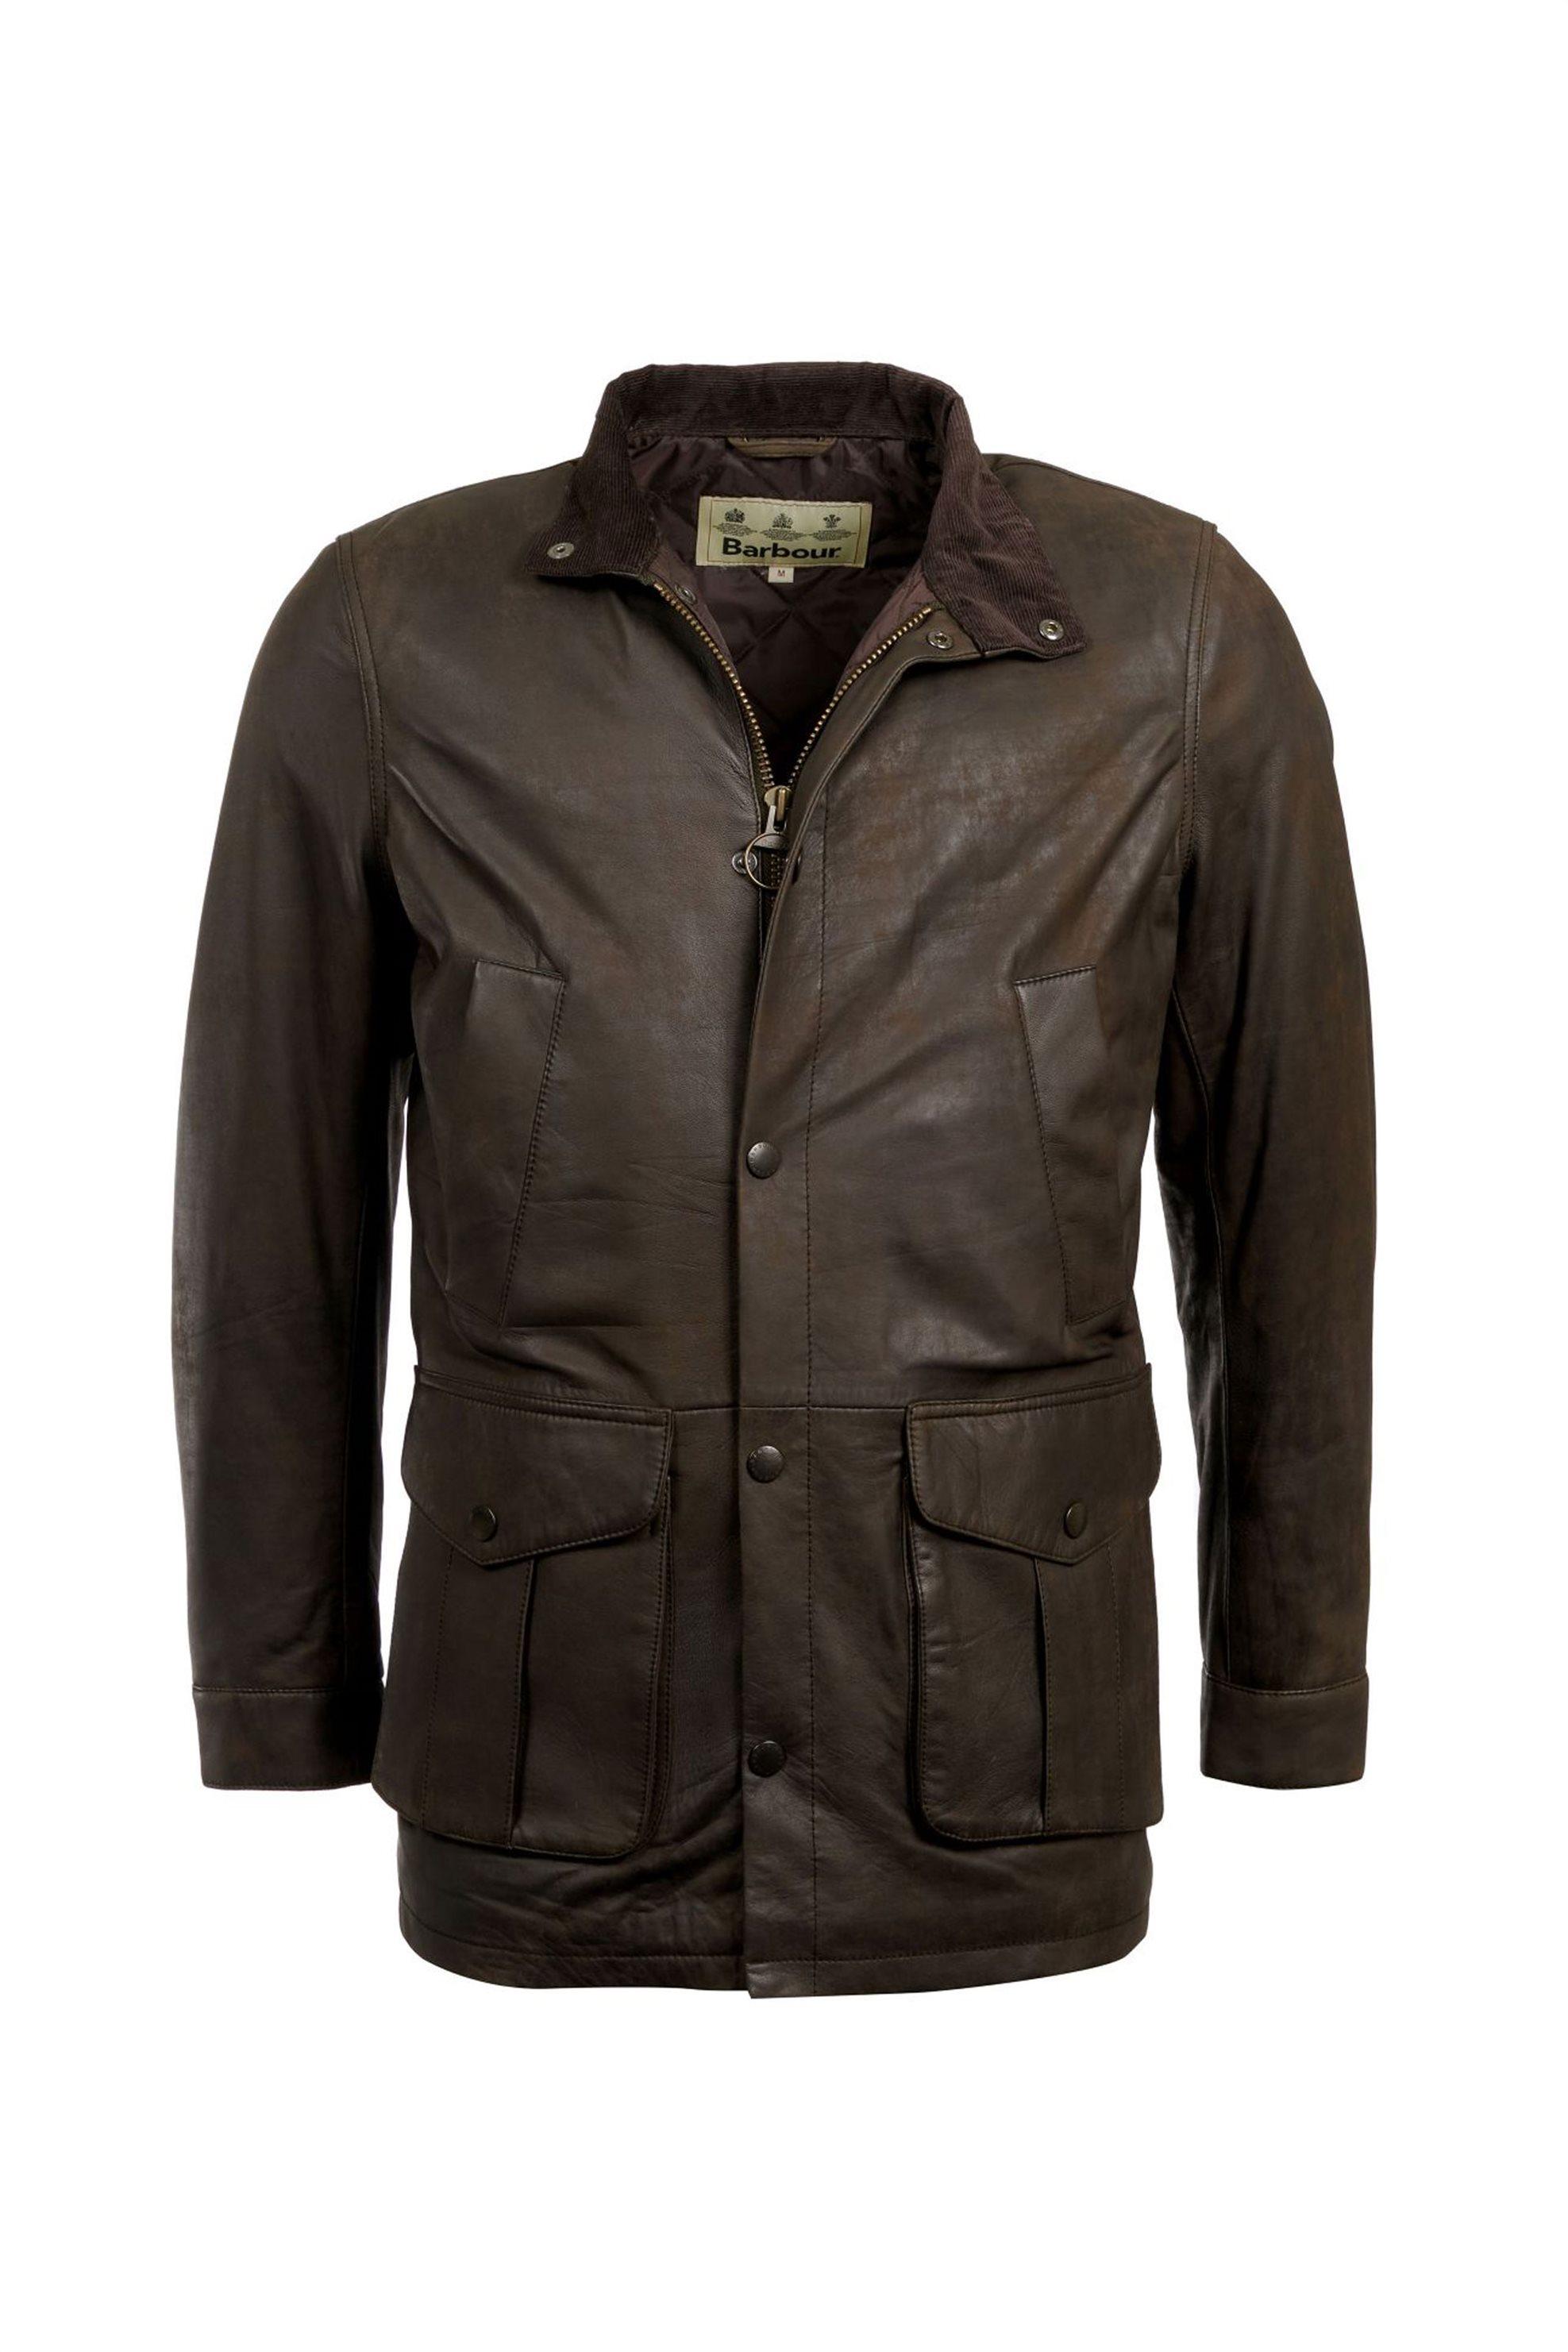 Barbourανδρικό δερμάτινο μπουφάν Thomas - MLT0081 - Λαδί ανδρασ   ρουχα   παλτό   μπουφάν   δερμάτινα